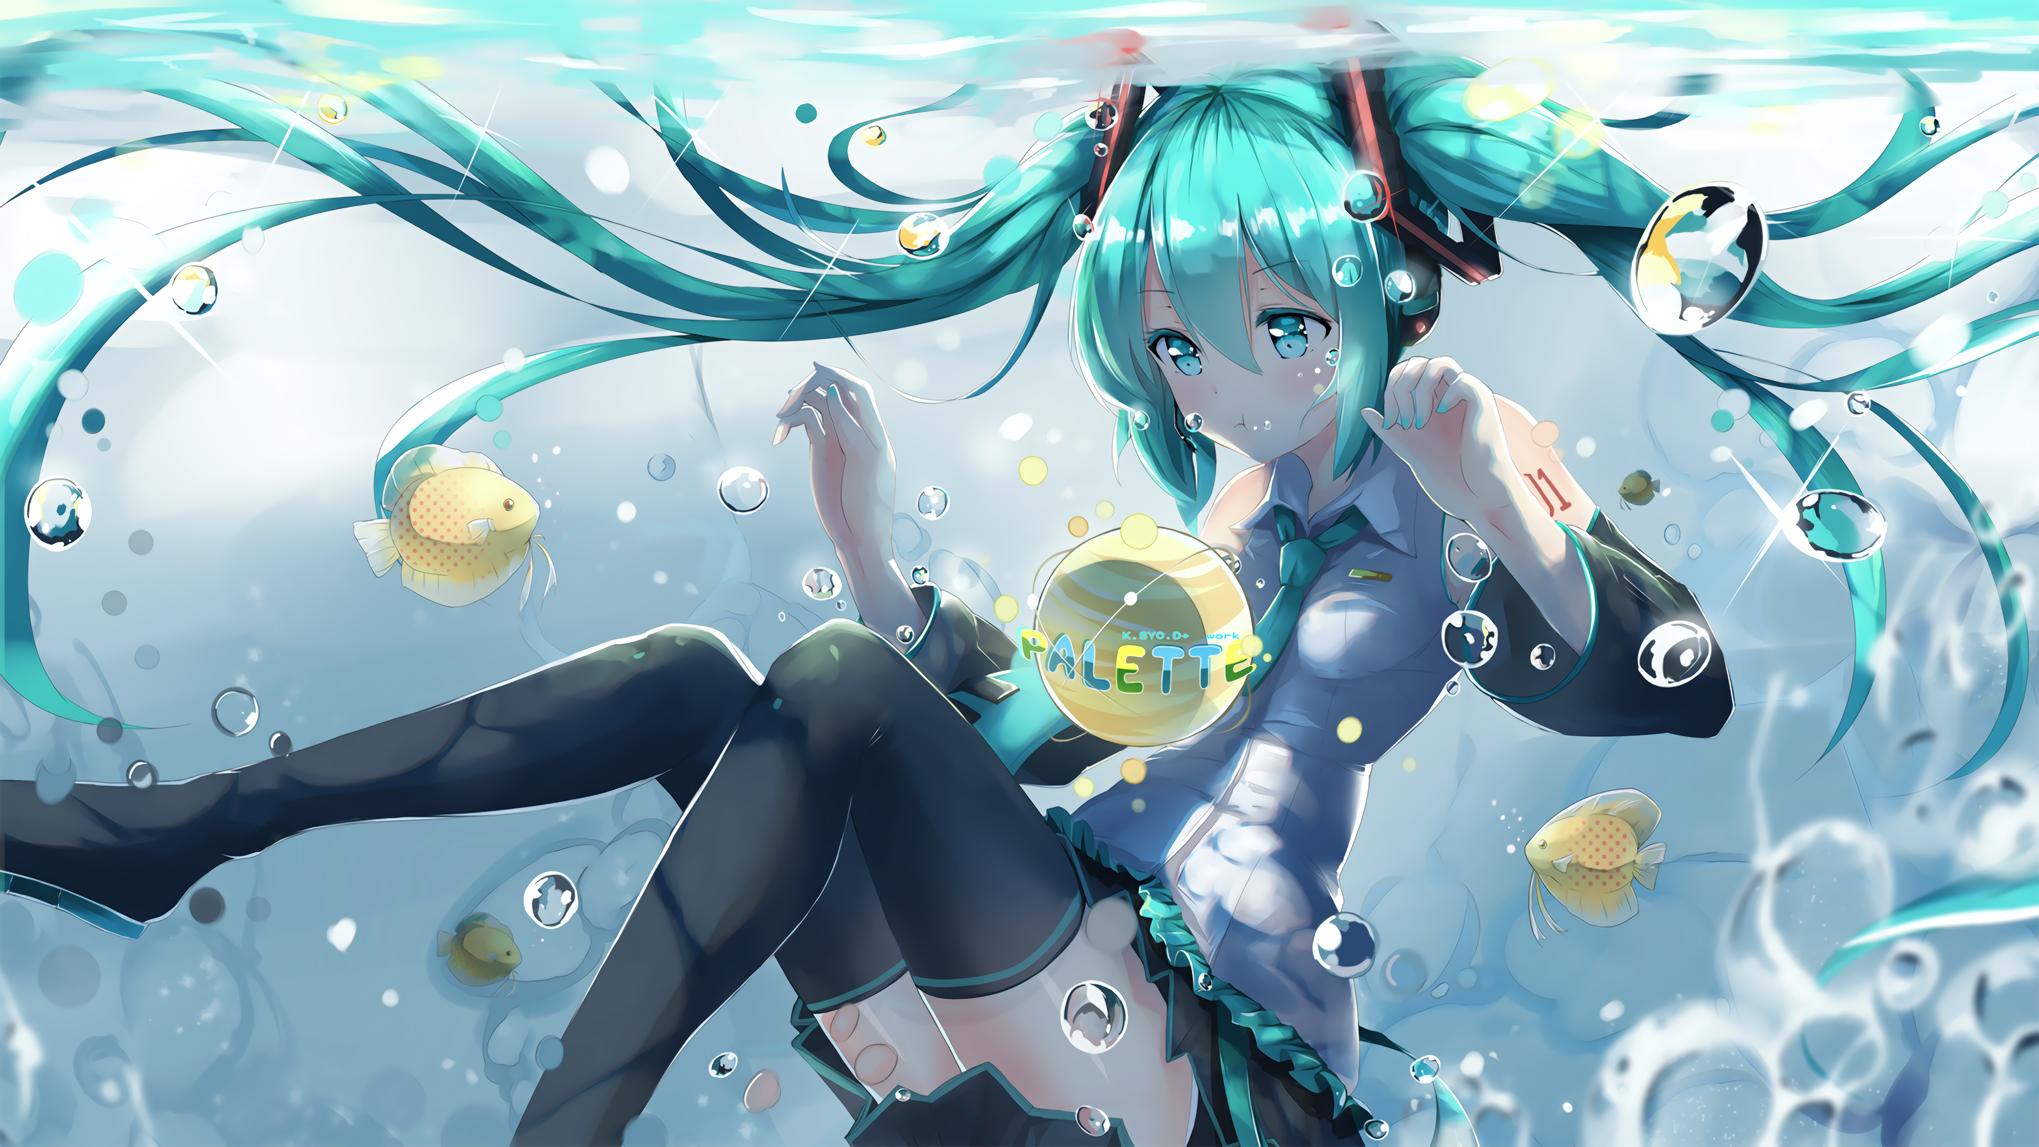 Anime 2039x1147 Hatsune Miku Vocaloid Underwater Fish Fondo De Pantalla De Anime Imagenes De Hatsune Miku Hatsune Miku